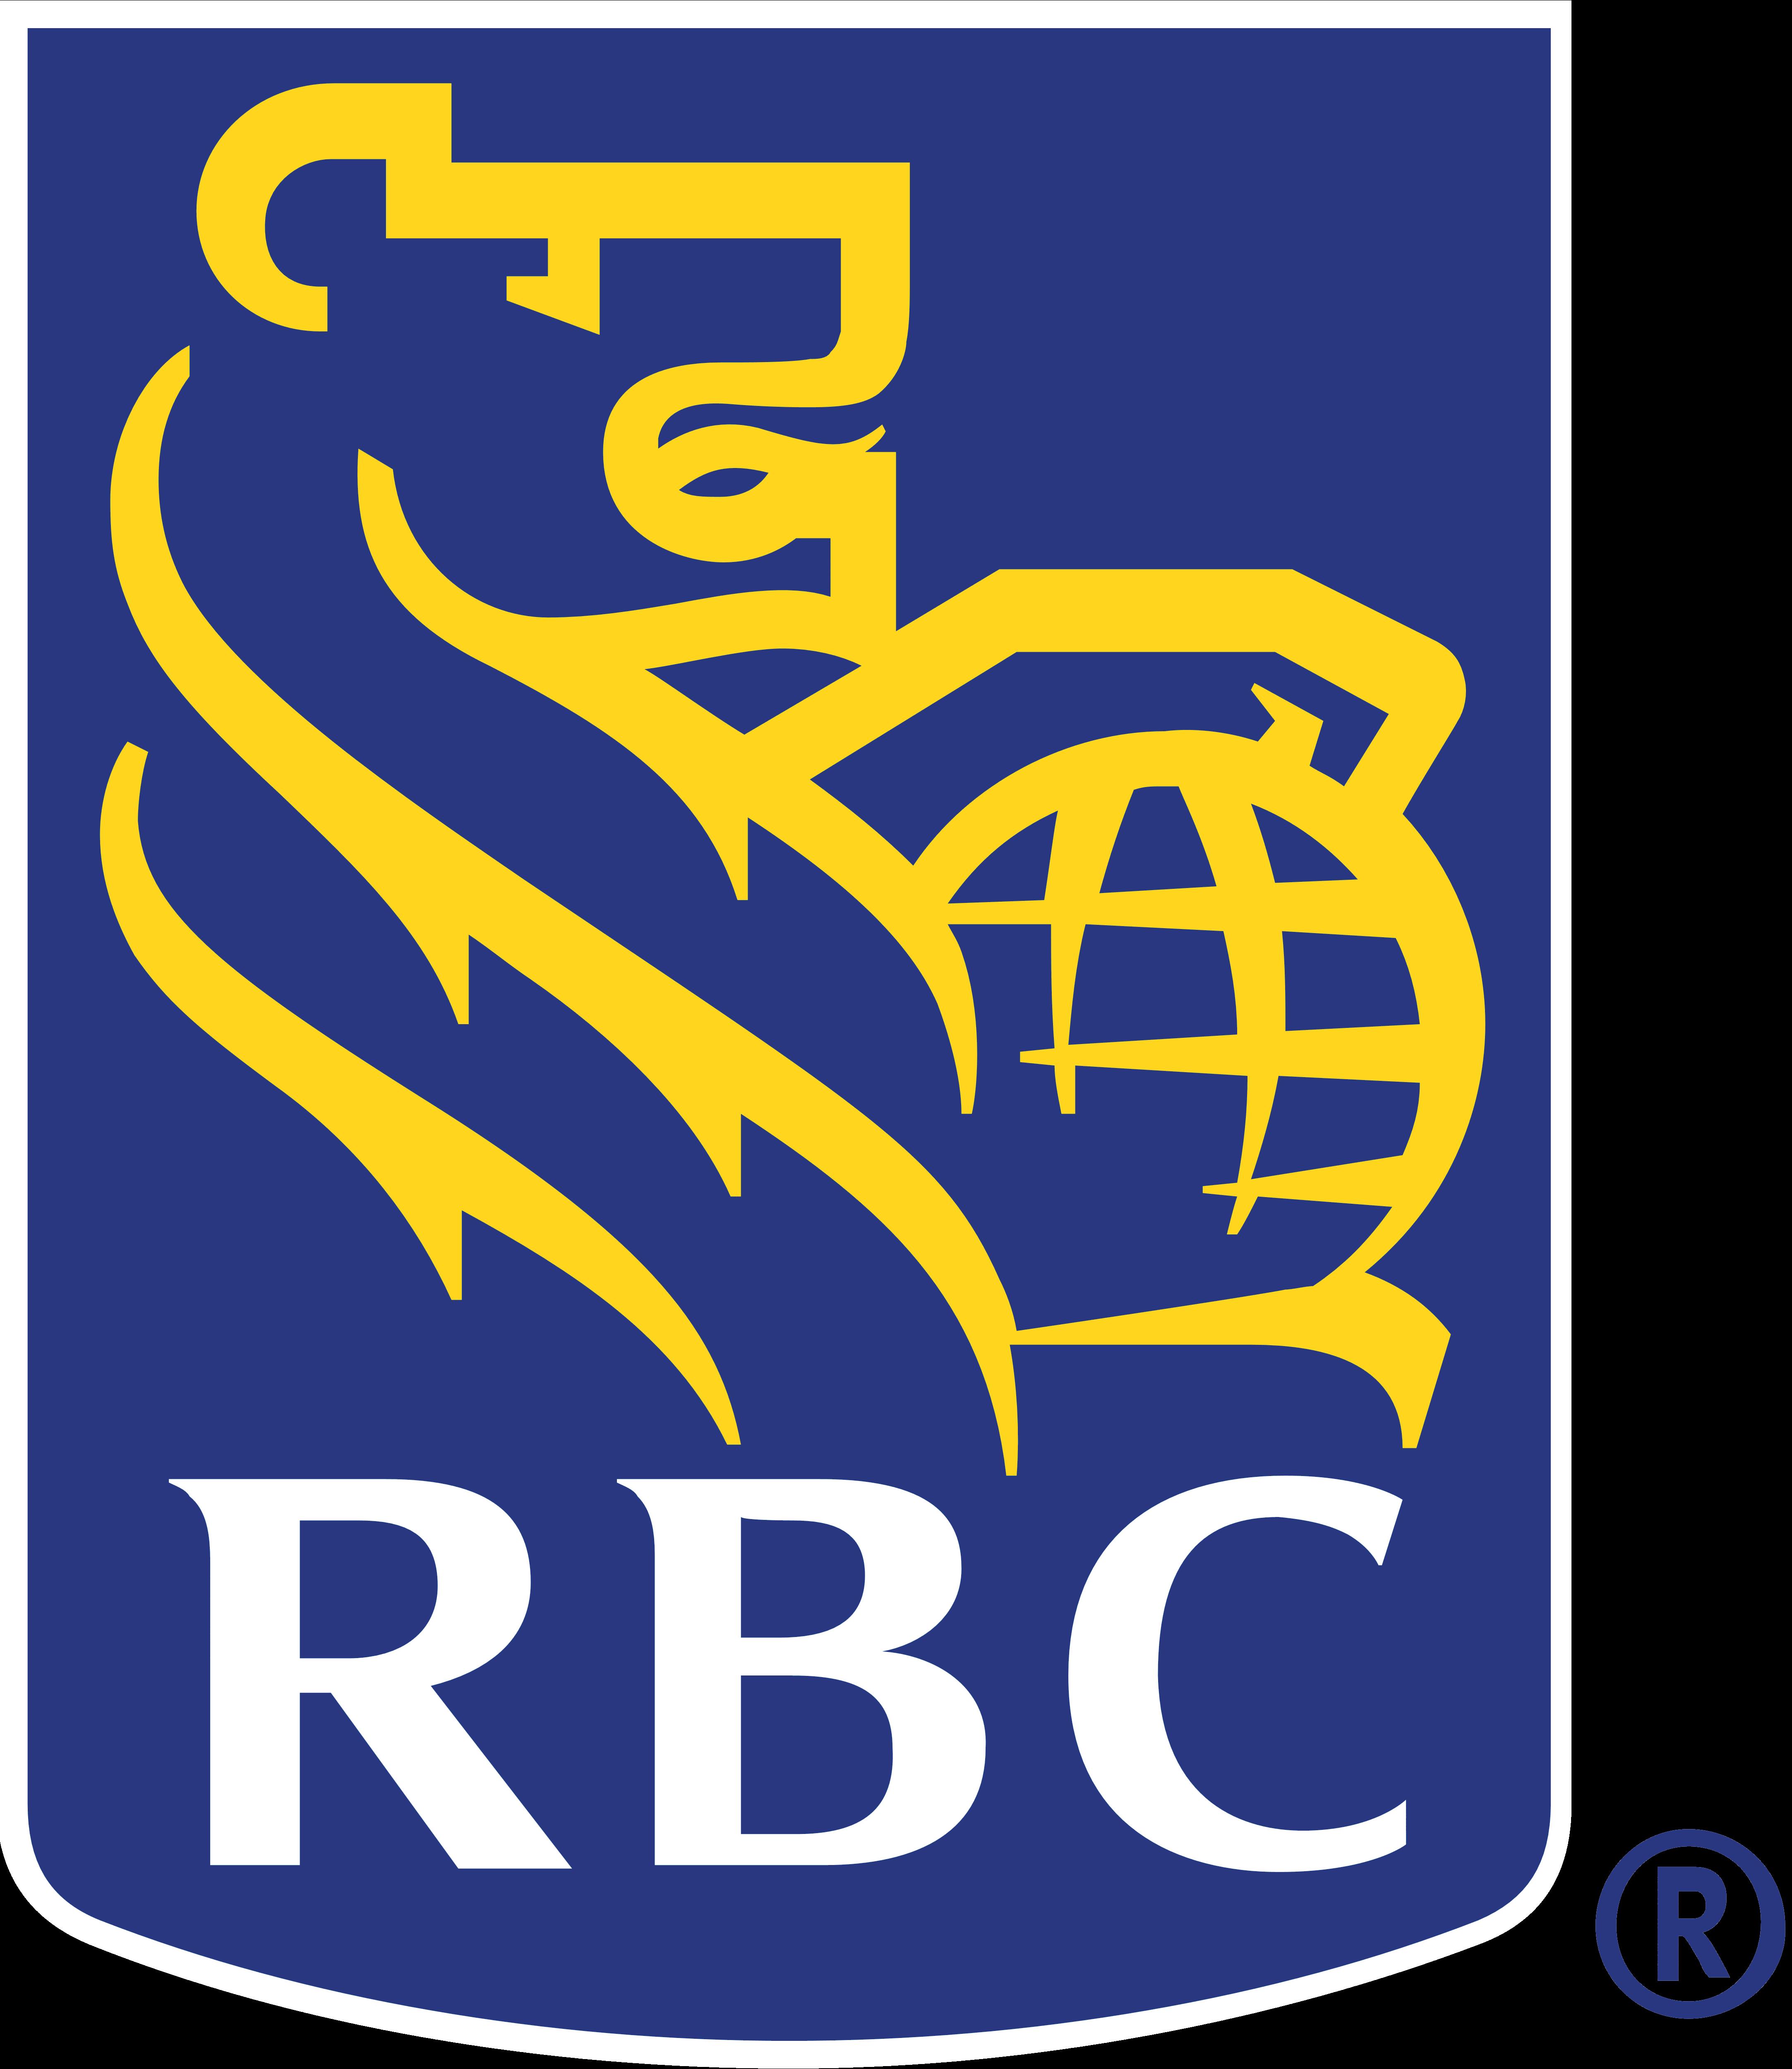 rbc royal bank of canada logos download. Black Bedroom Furniture Sets. Home Design Ideas